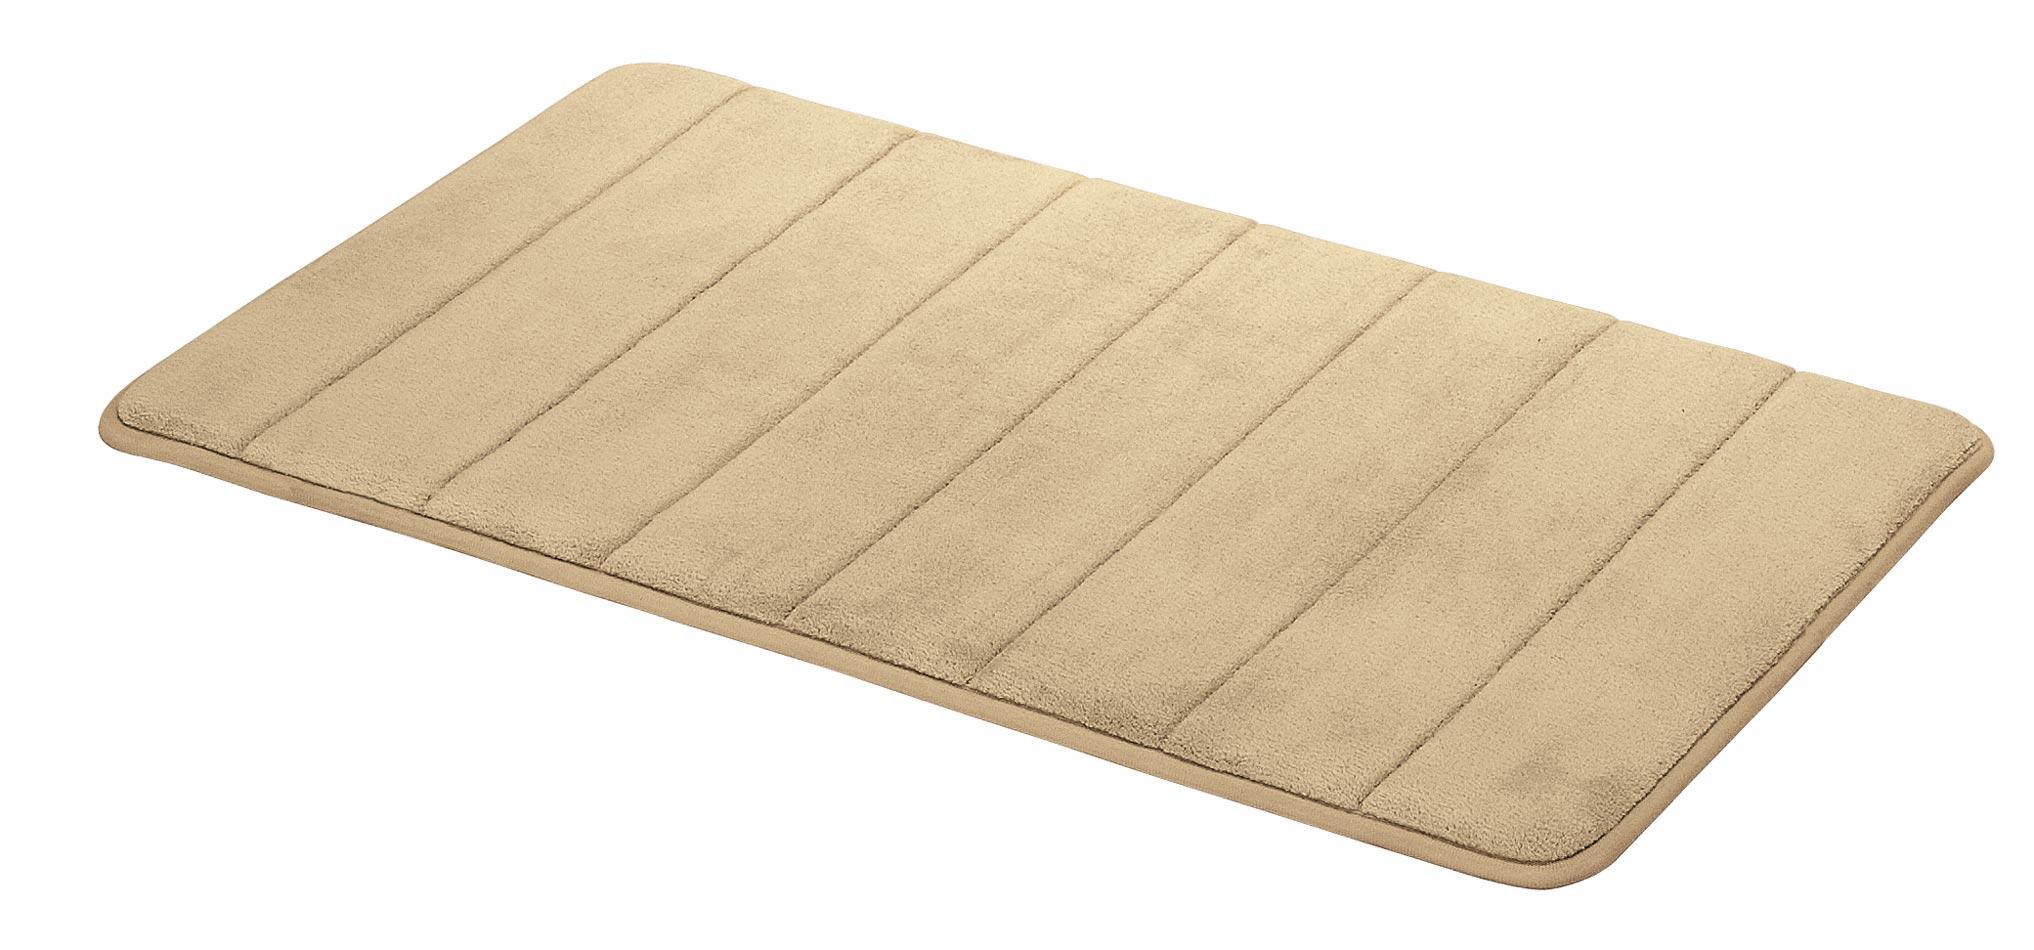 miles kimball microfiber memory foam bath mat ebay. Black Bedroom Furniture Sets. Home Design Ideas